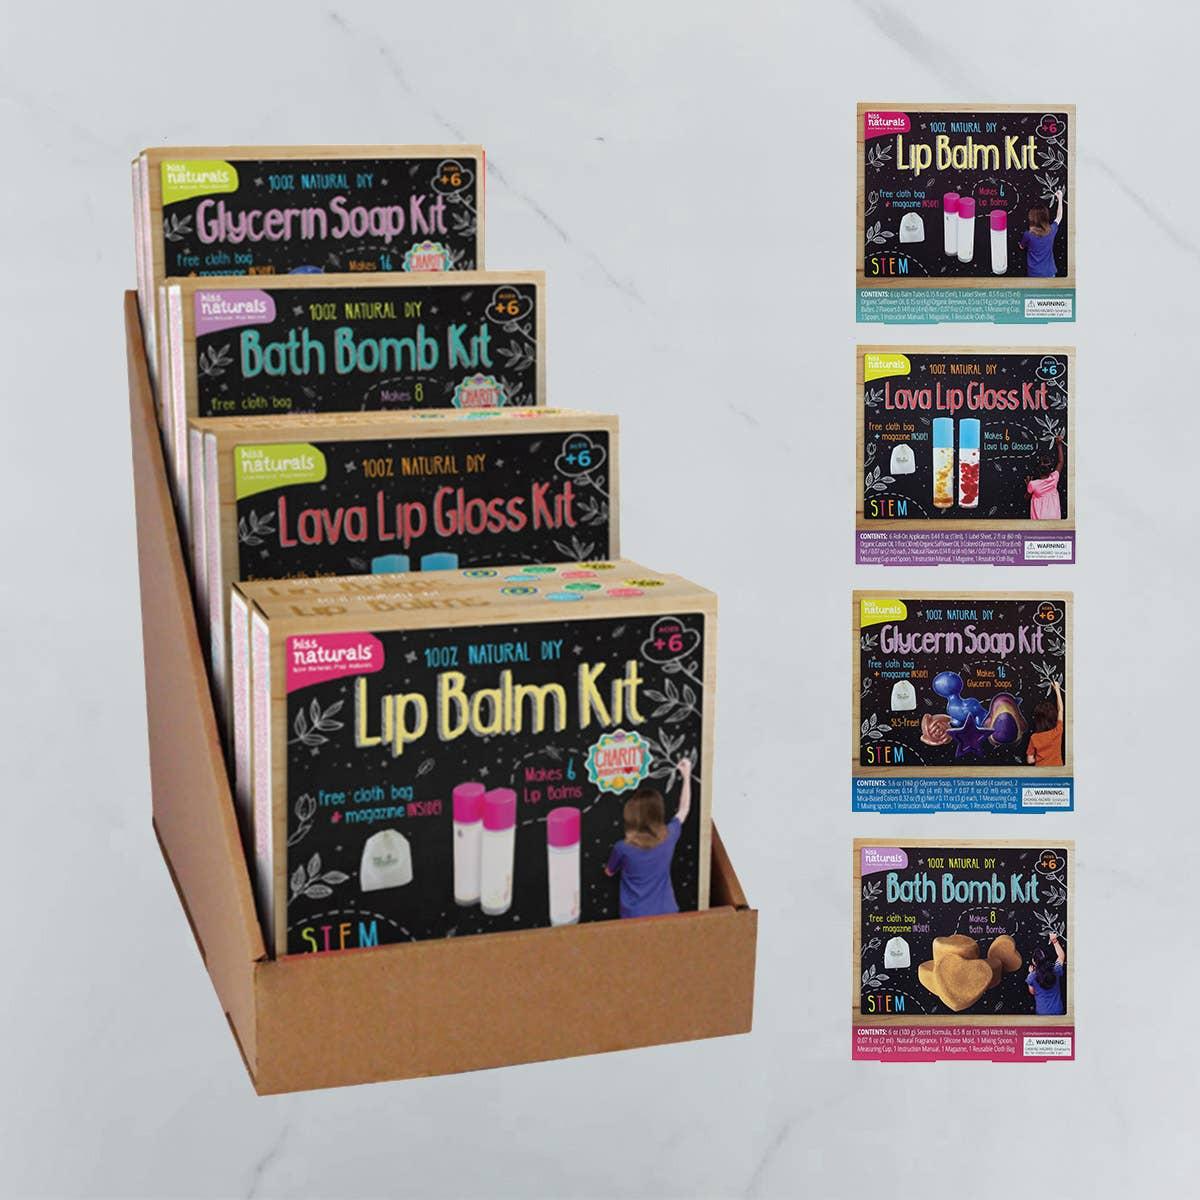 32 all-natural DIY Craft Kits with Cardboard Display   Trada Marketplace